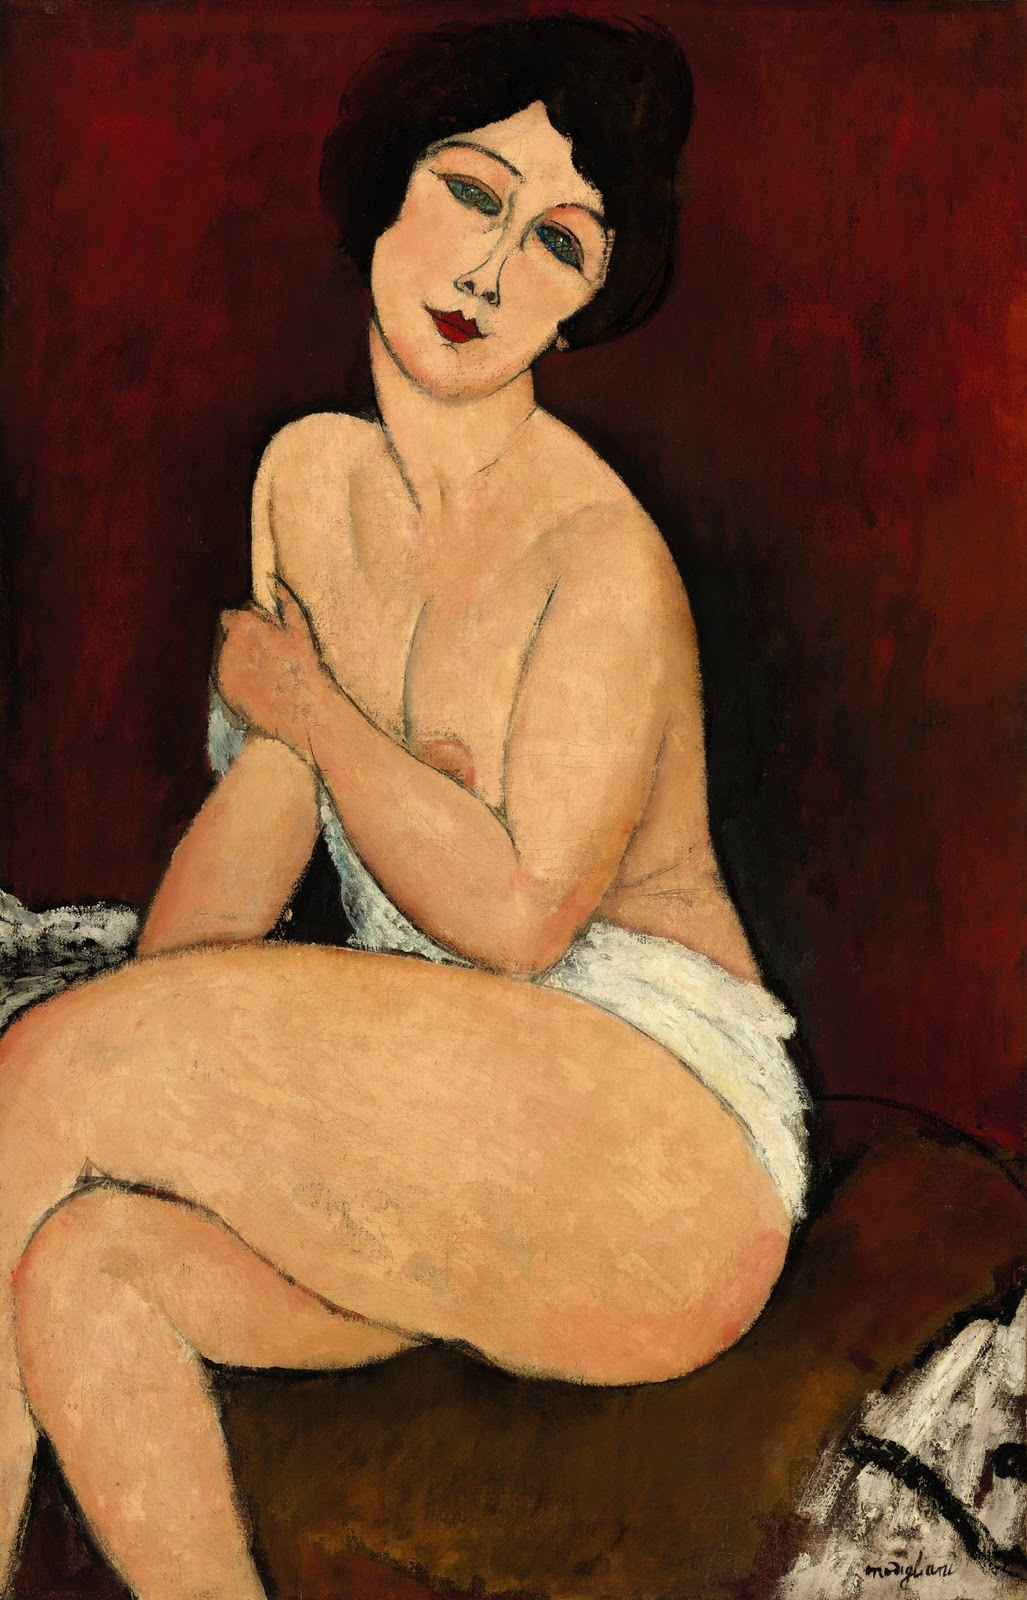 http://4.bp.blogspot.com/_9XtBjnLeEPU/TNC6ZnW0HQI/AAAAAAAAAOQ/WVL_K8xJDWY/s1600/8675+Modigliani,+La+Belle+Romaine+Lot+7.jpg